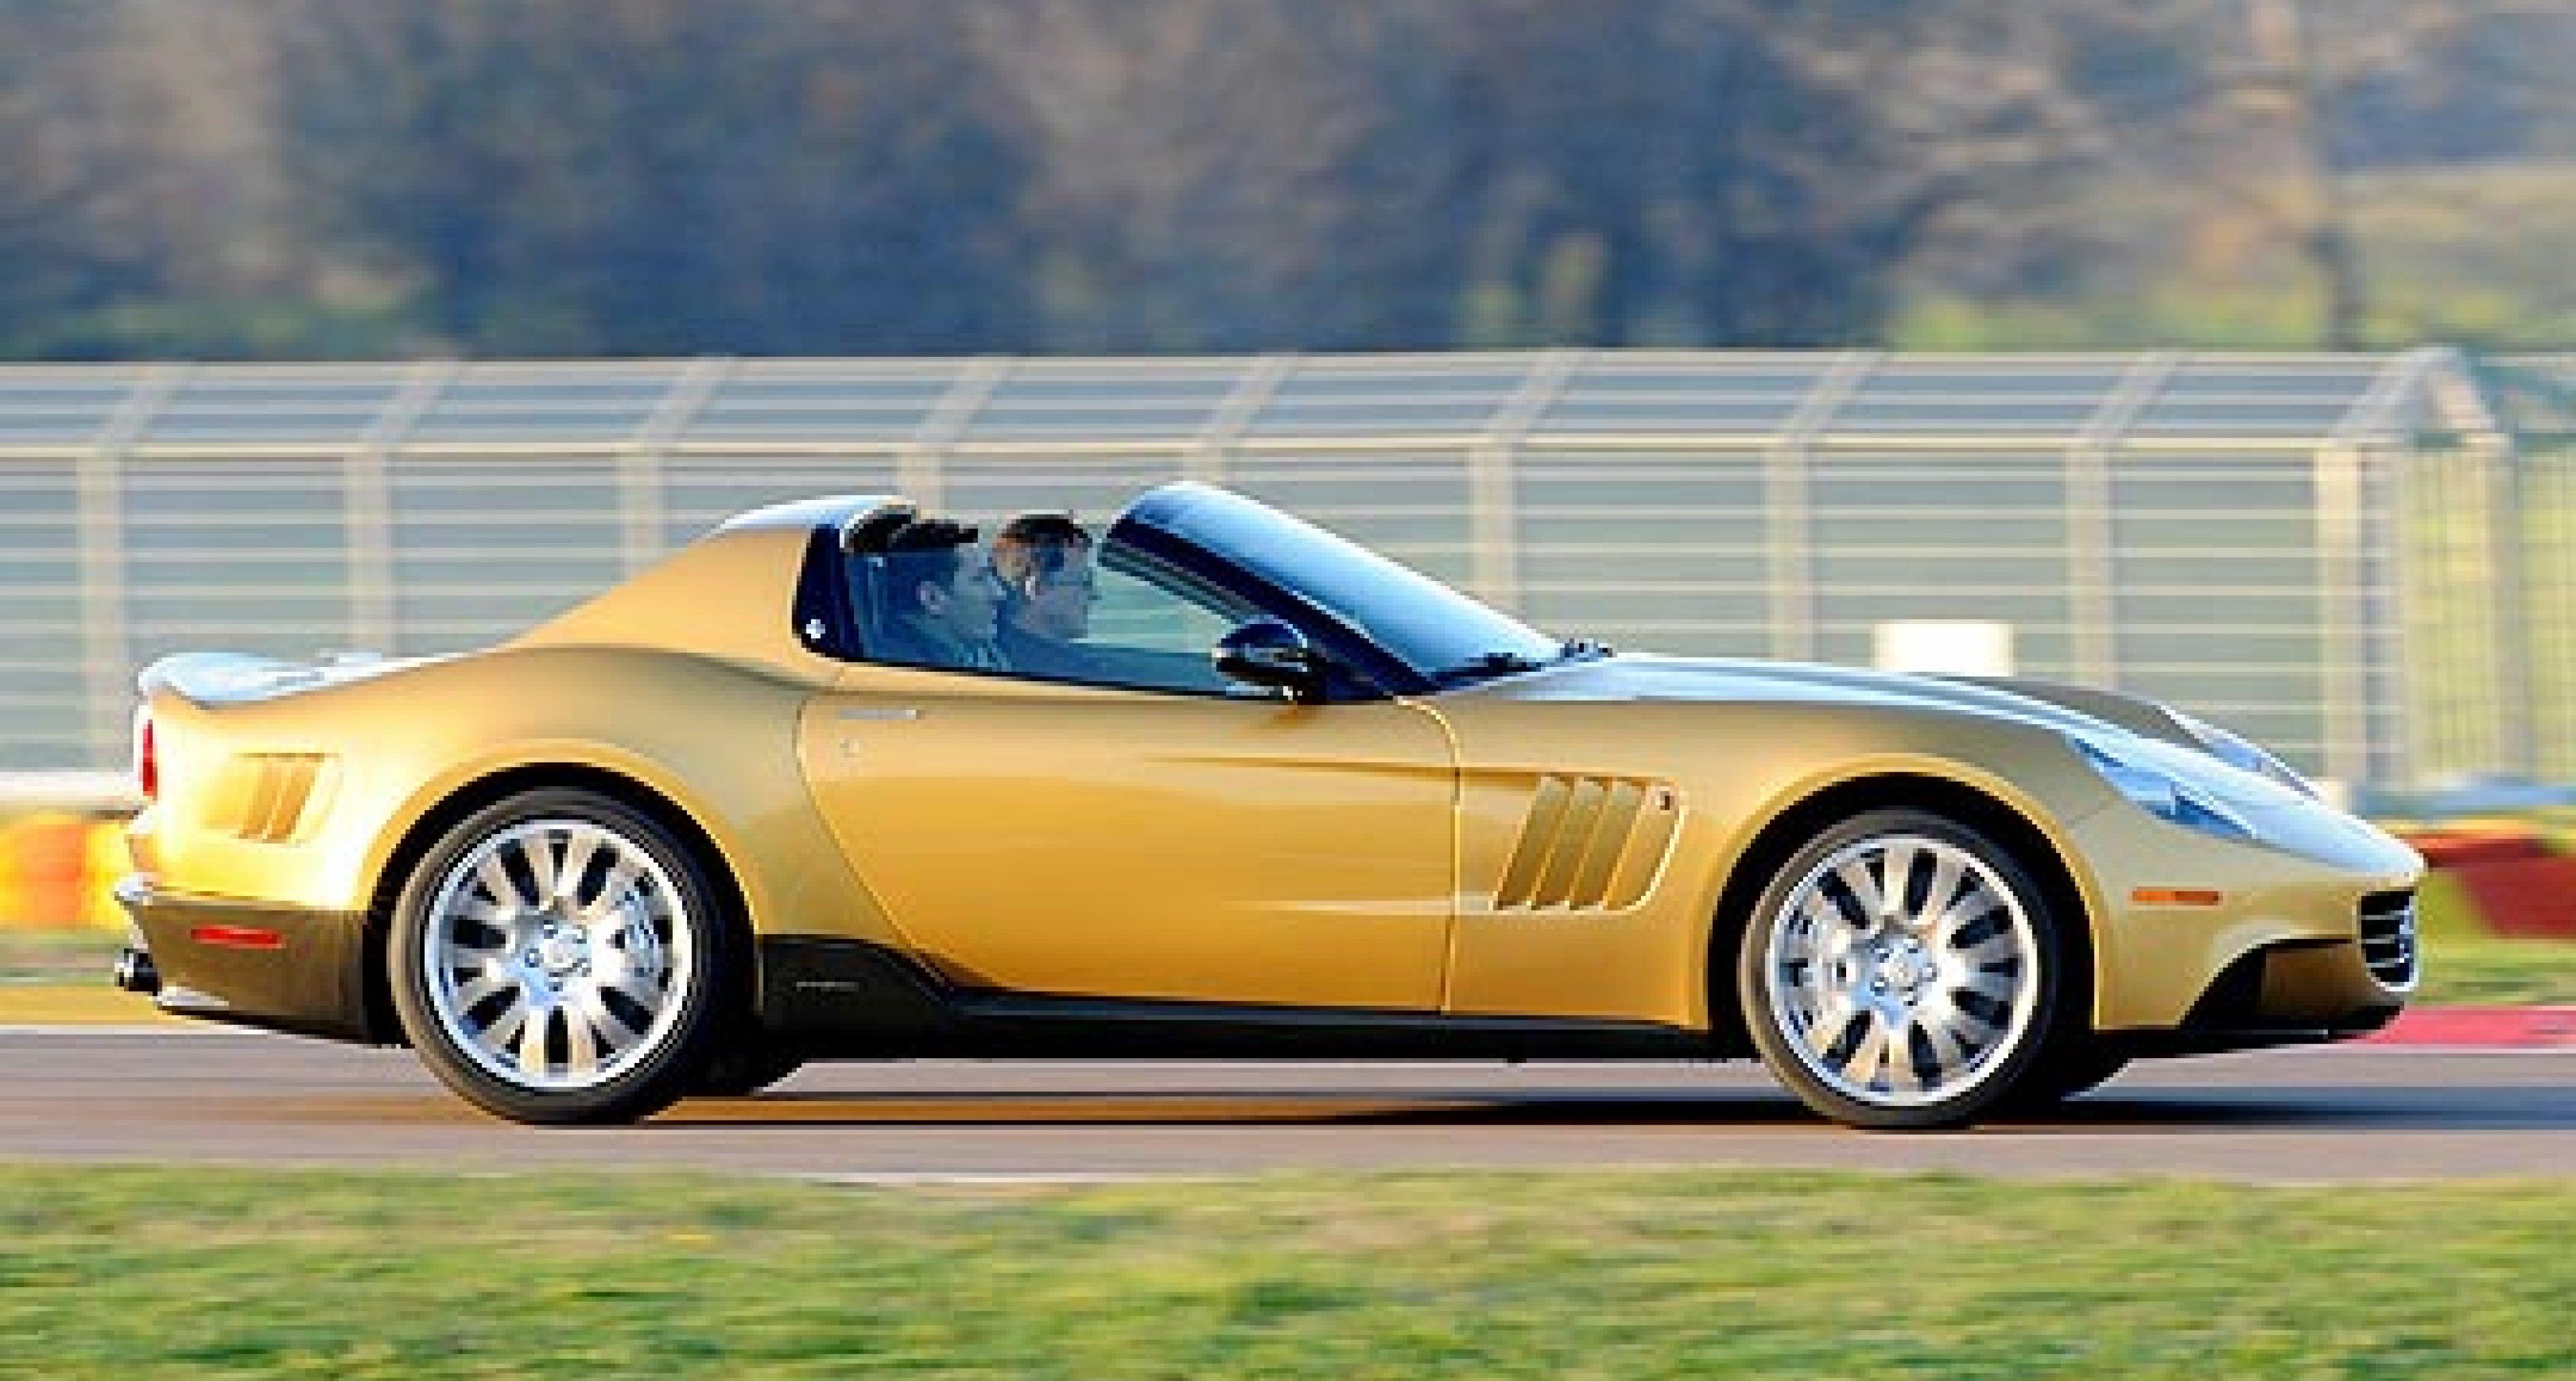 Ferrari P540 Superfast Aperta: Targa auf Kundenwunsch